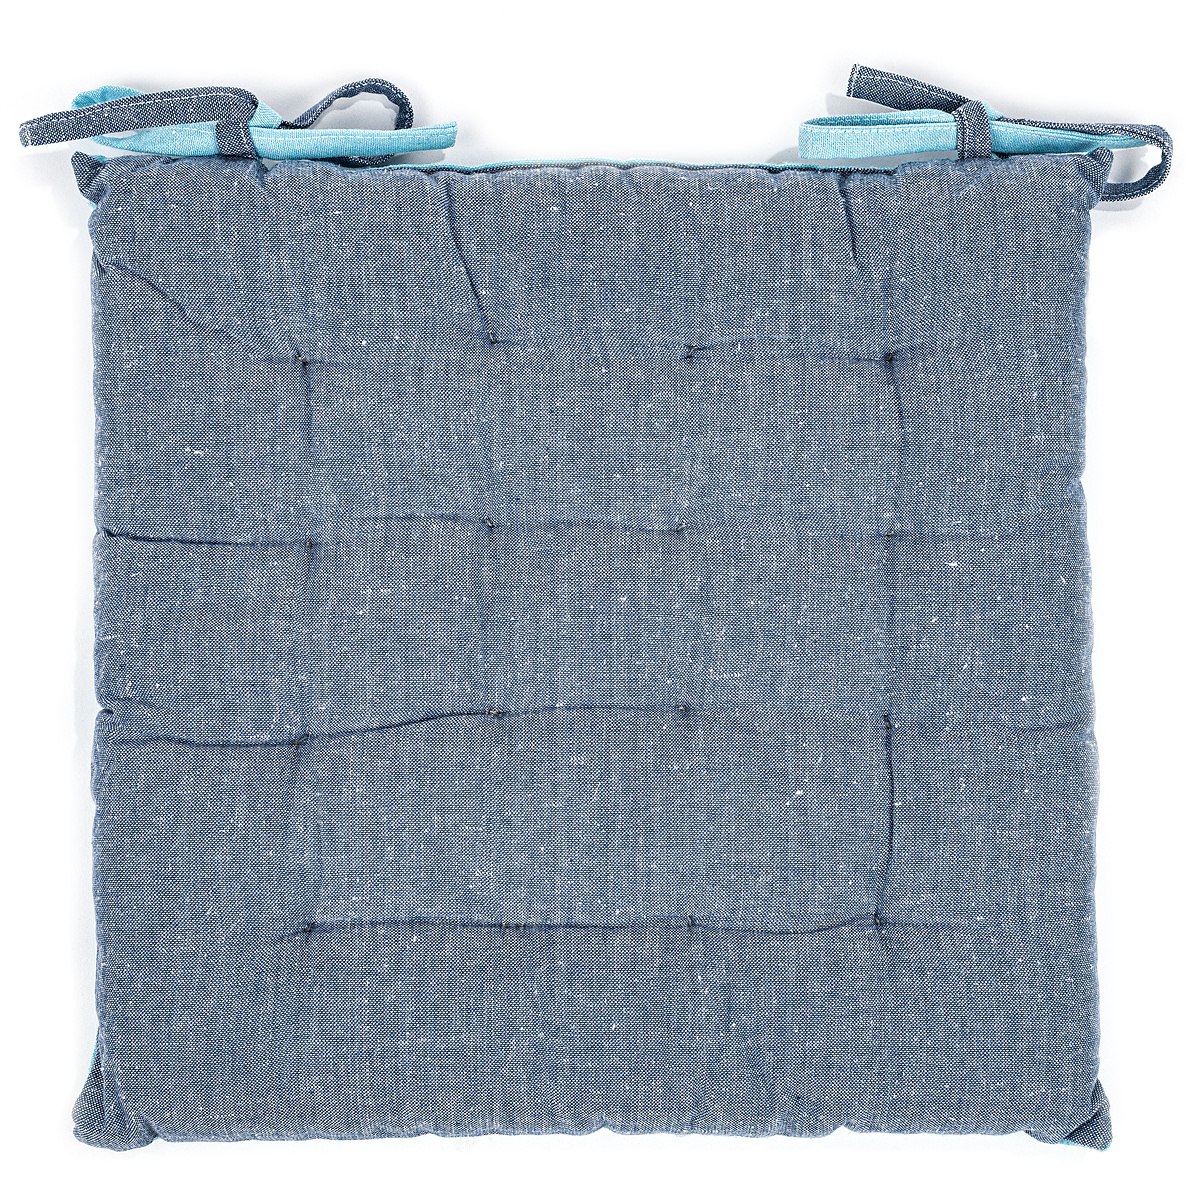 Trade Concept Prošívaný sedák Heda modrá, 40 x 40 cm